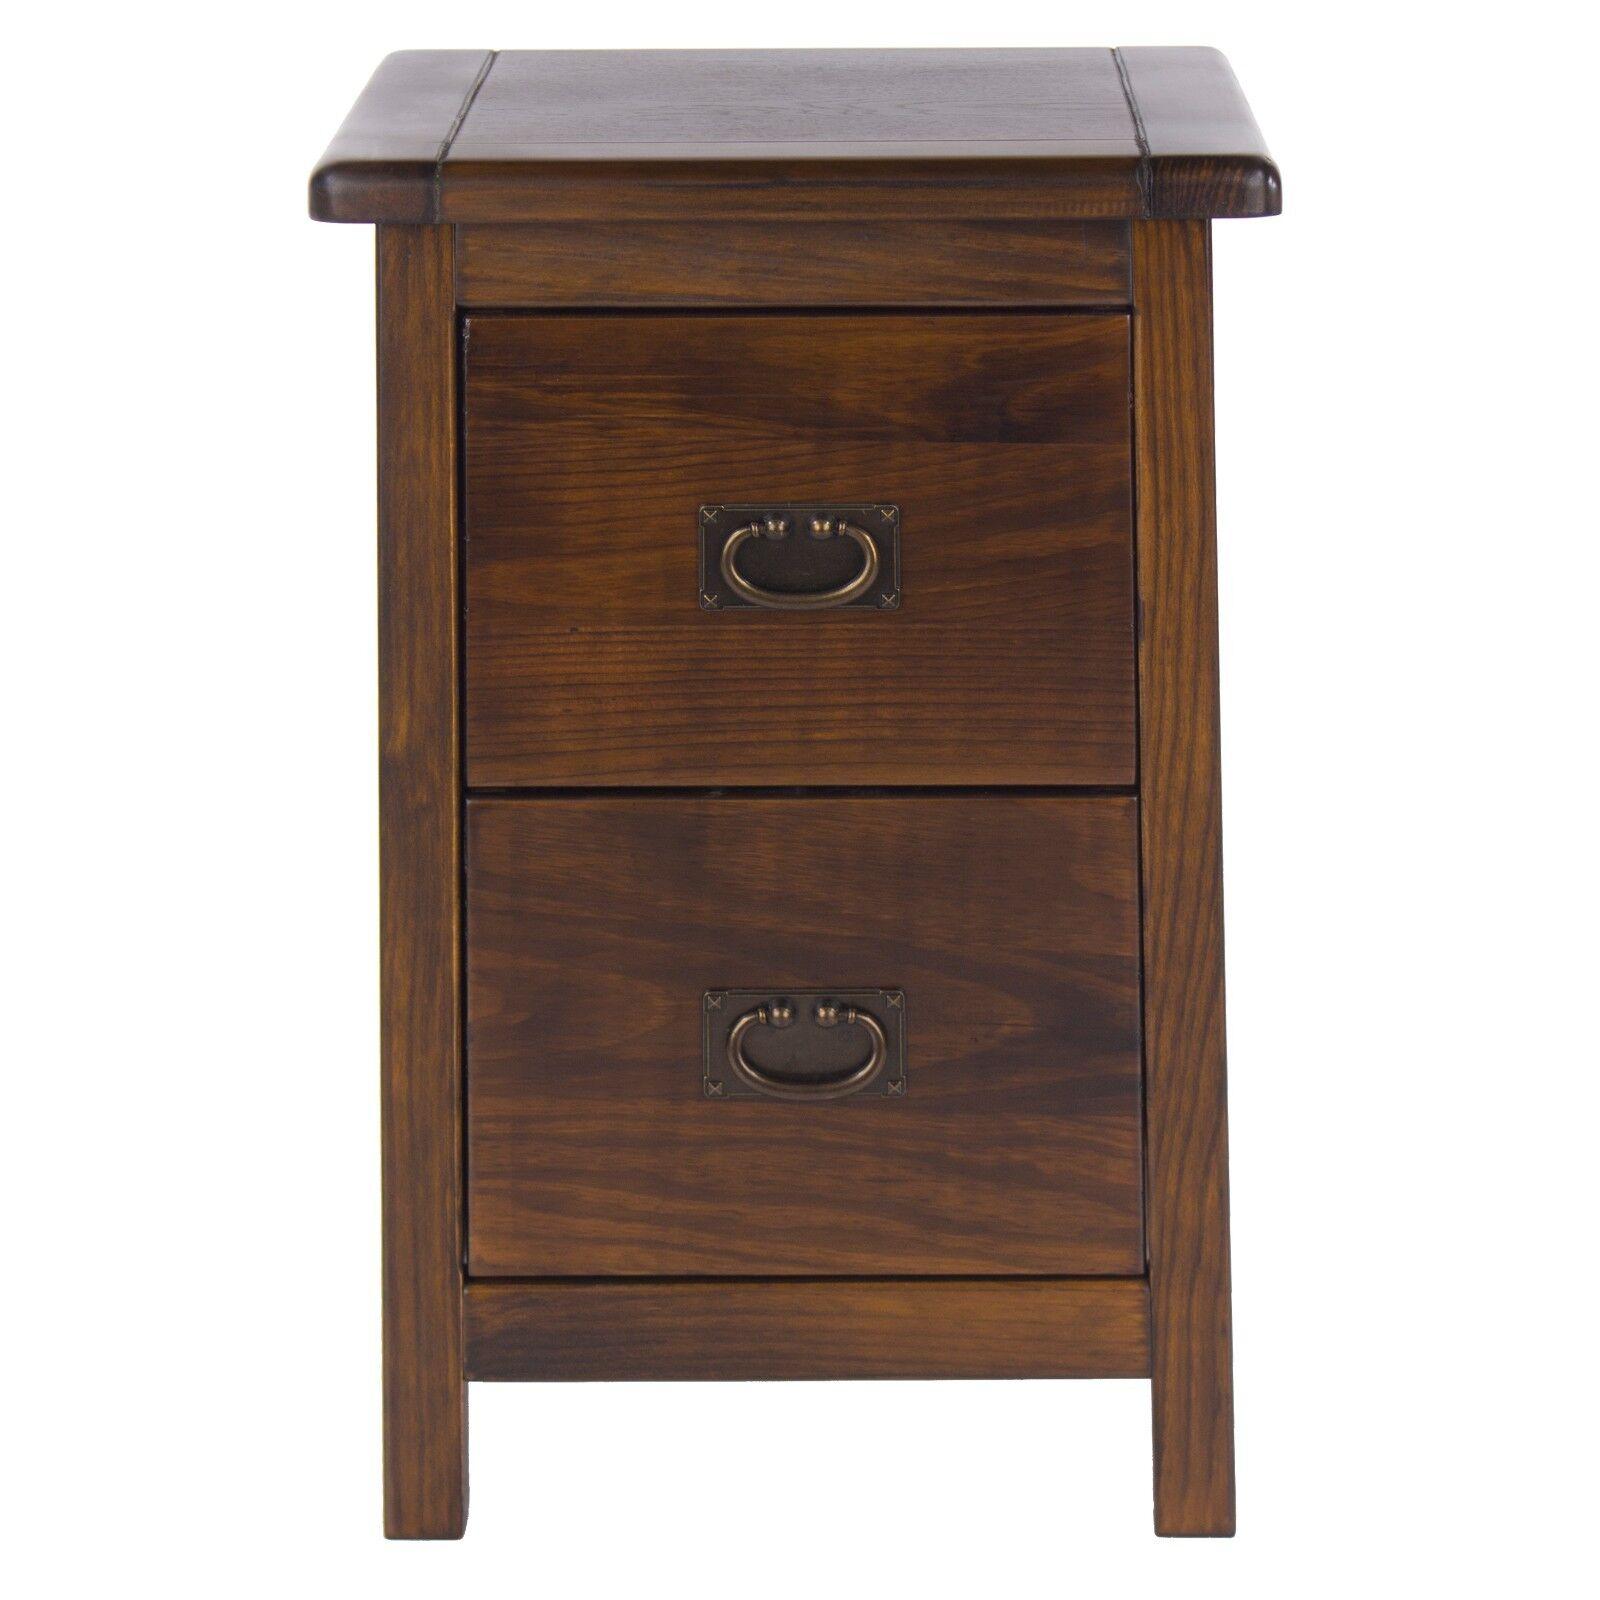 Baltia Dark Wood 2 Drawer Bedside Cabinet Table Solid Storage Bedroom